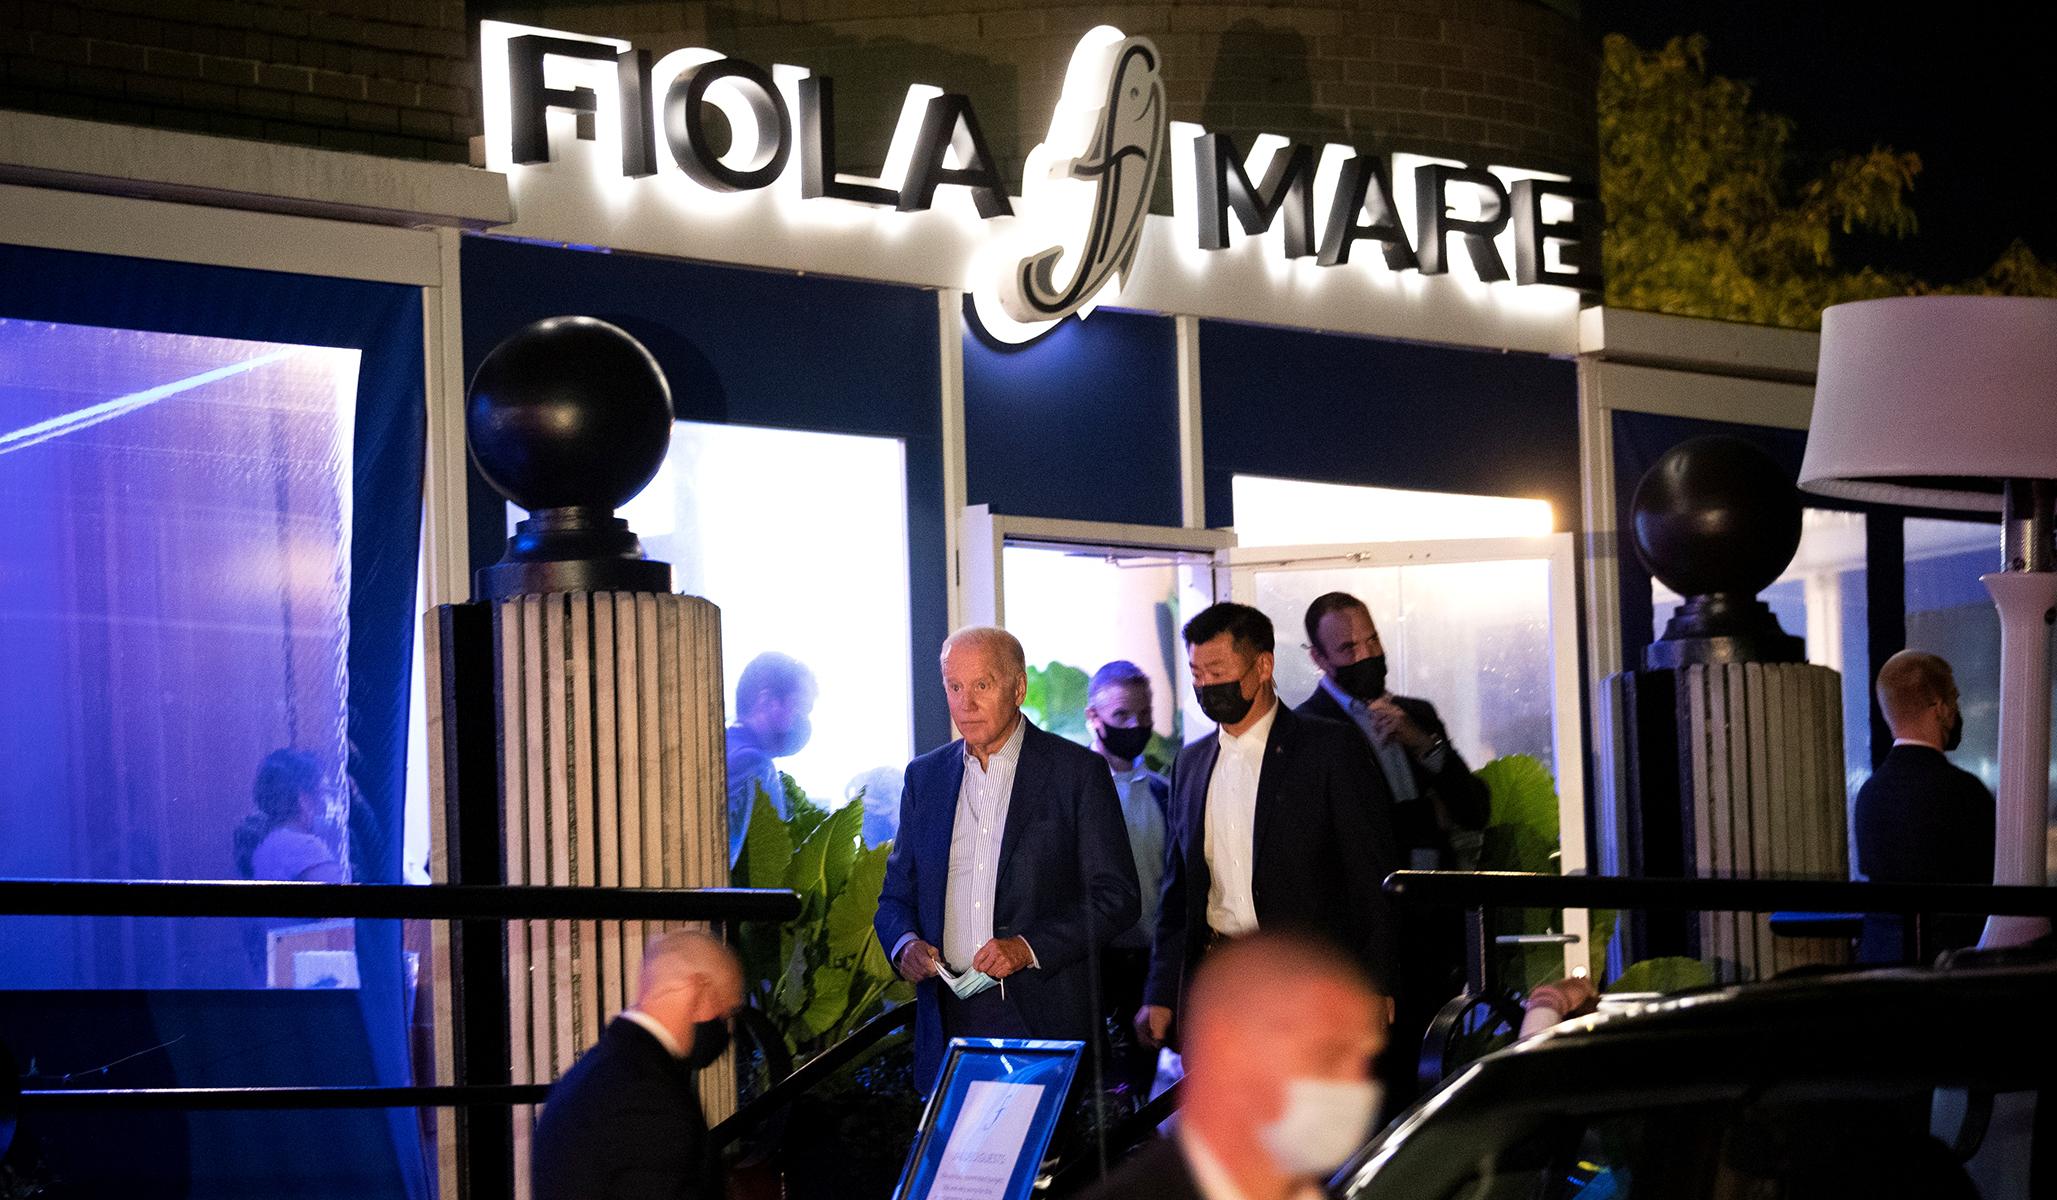 Biden Caught on Video Violating D.C. Mask Mandate at Upscale Restaurant